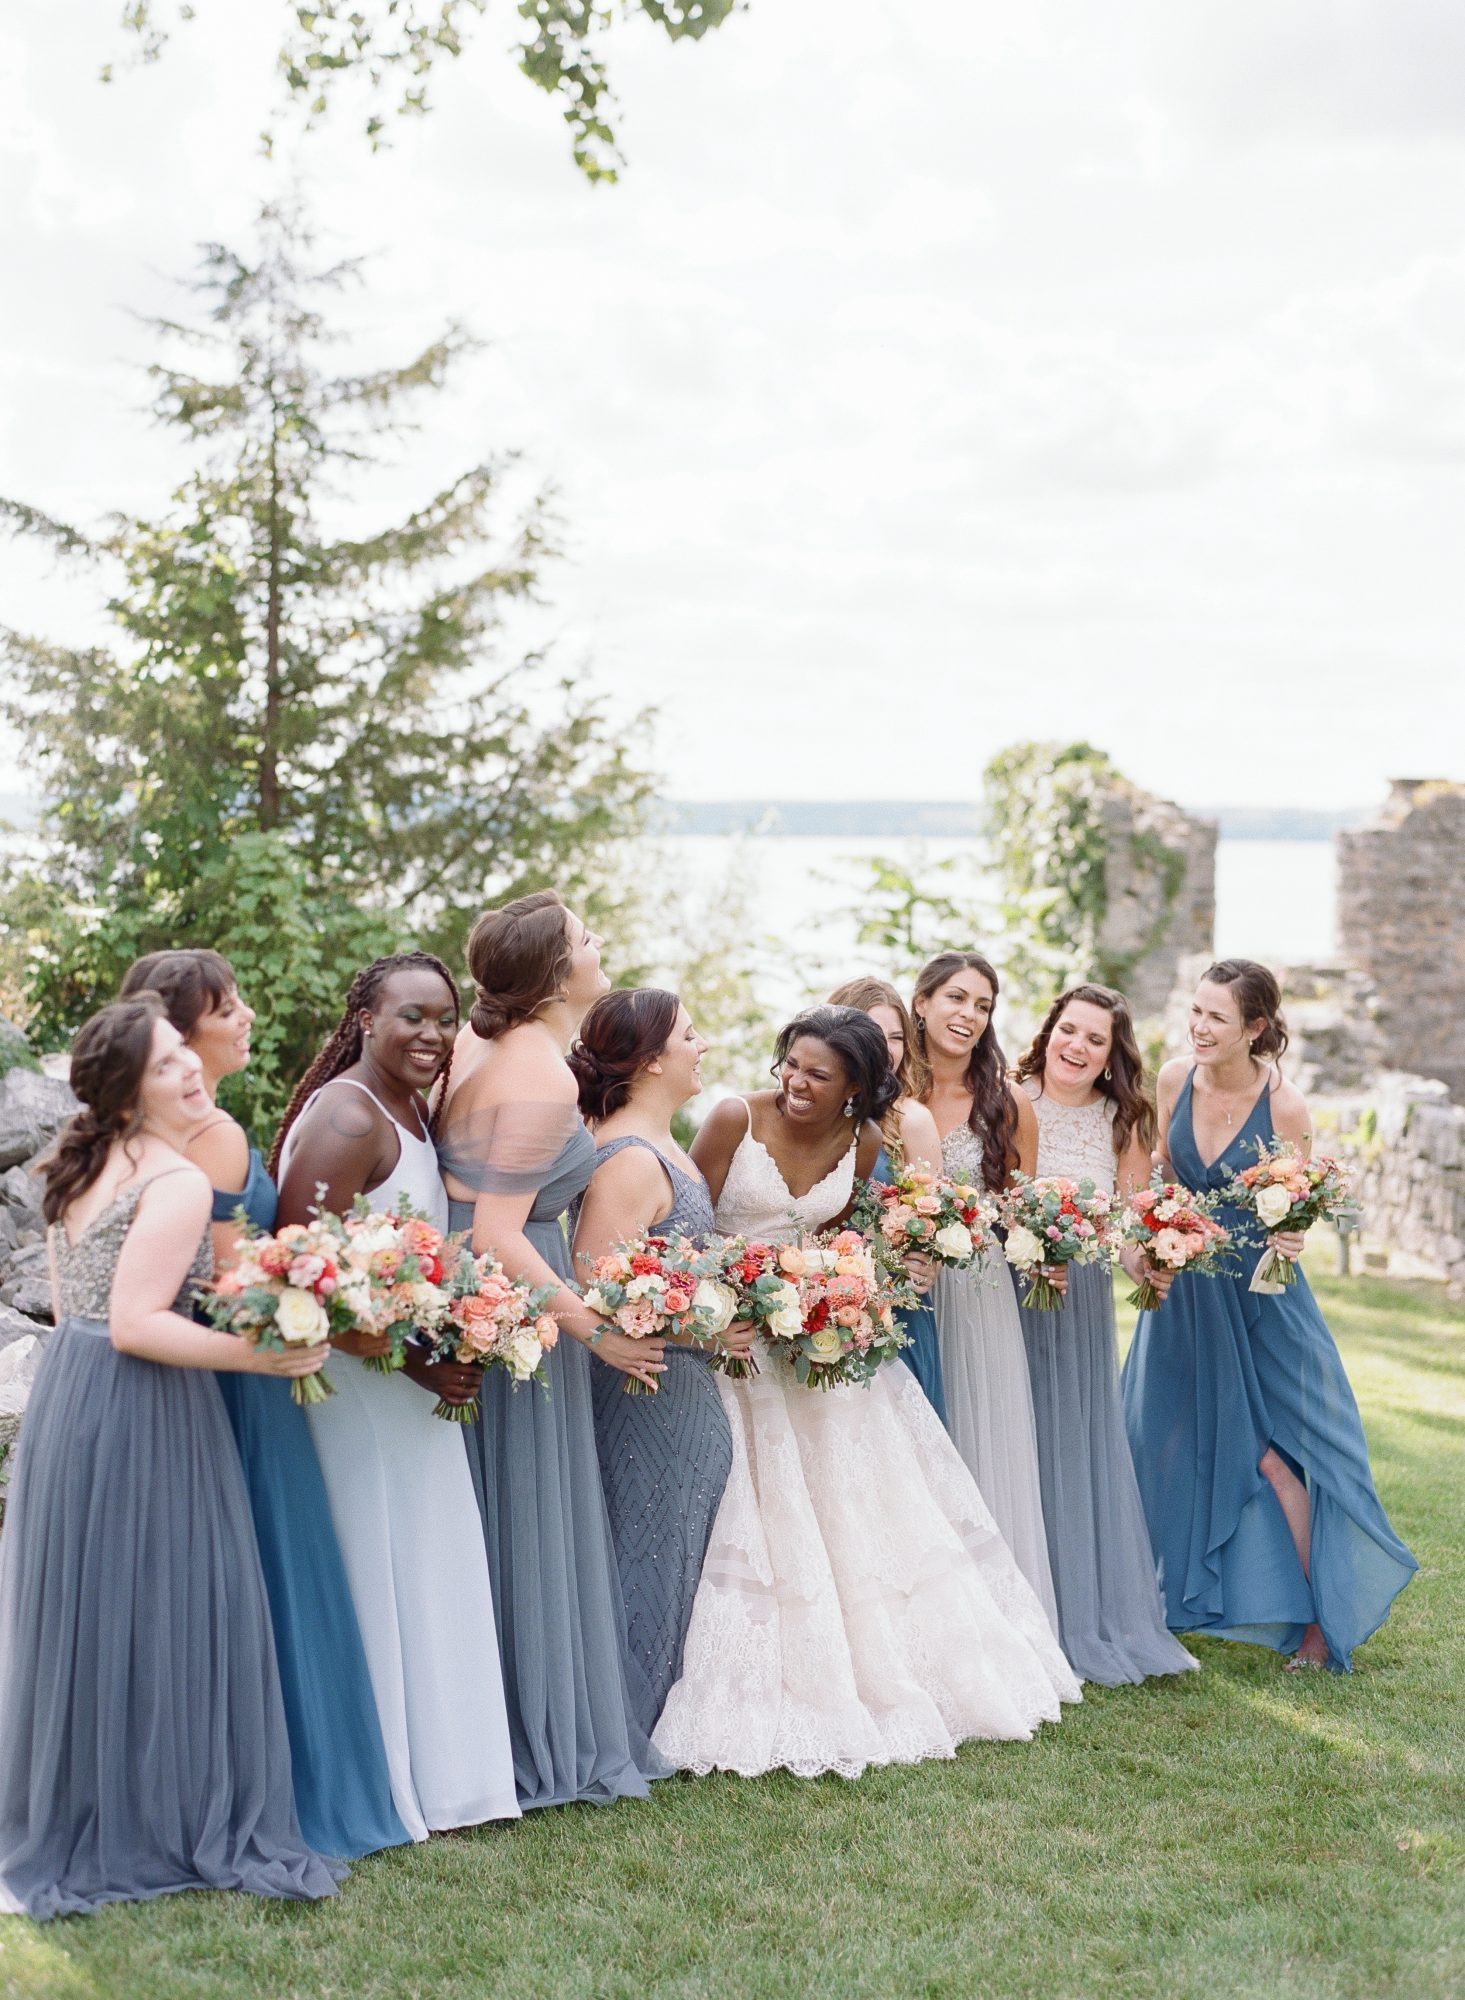 charlene jeremy wedding bridal party portrait